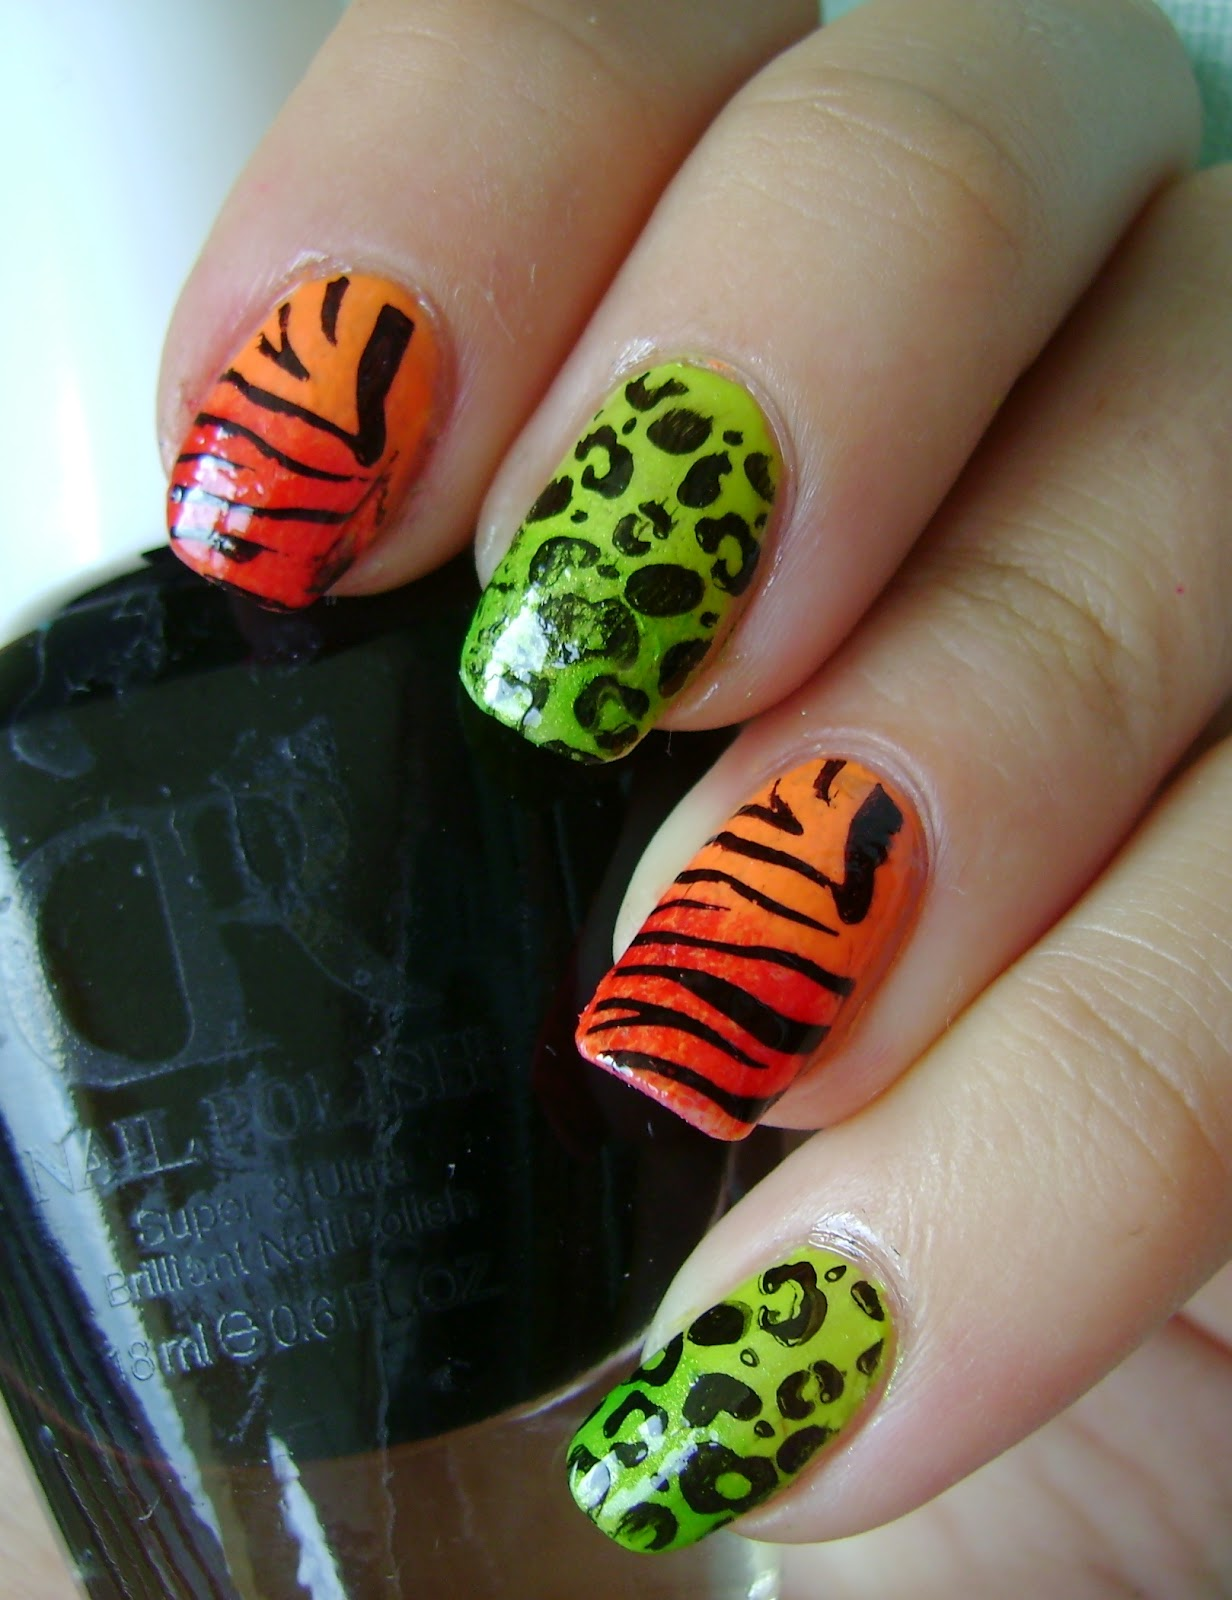 acrylic nail art designs: Wild animal print manicure